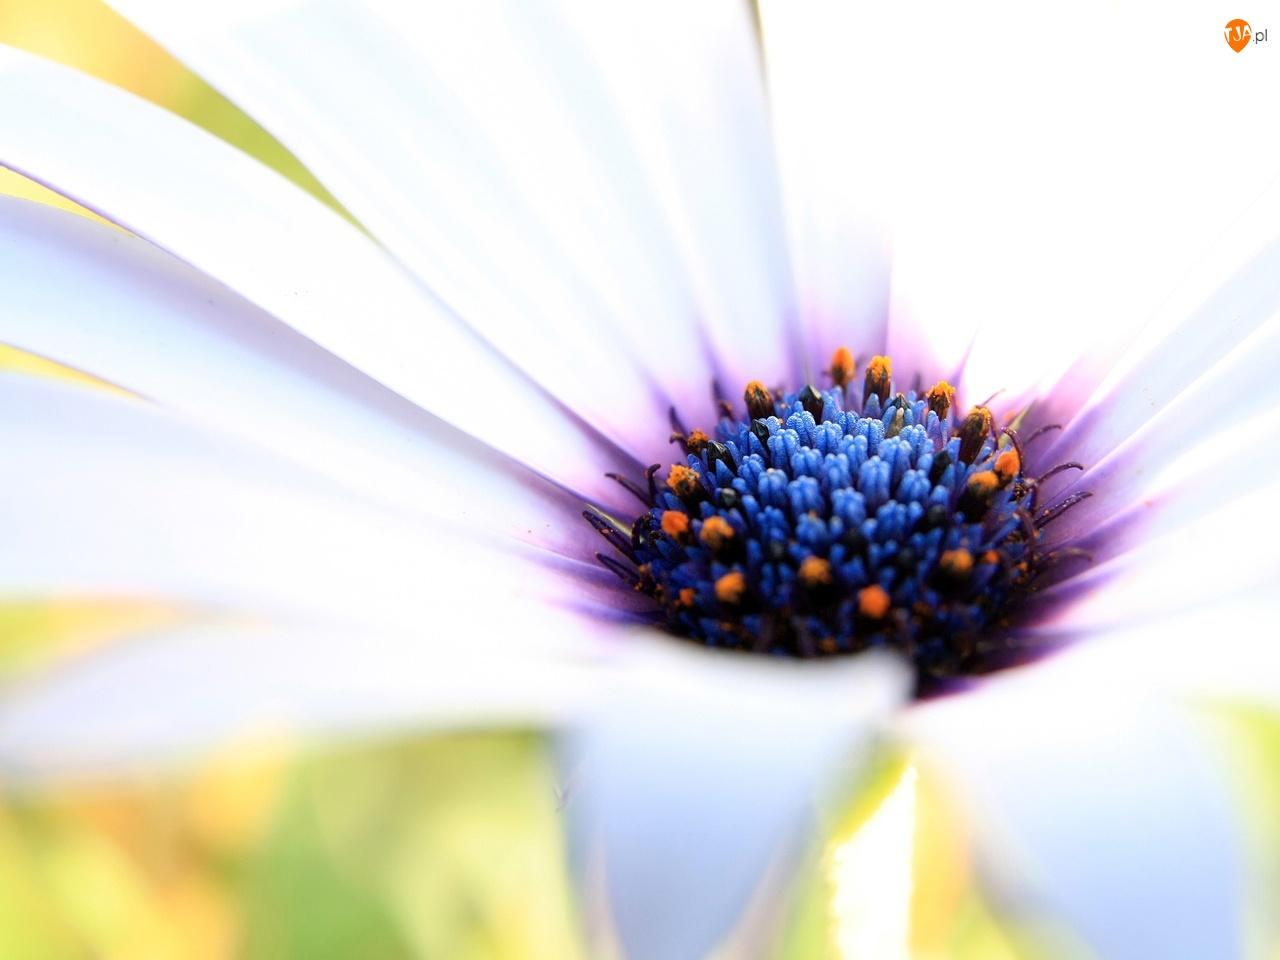 Biały, Środek, Kwiat, Kolorowy